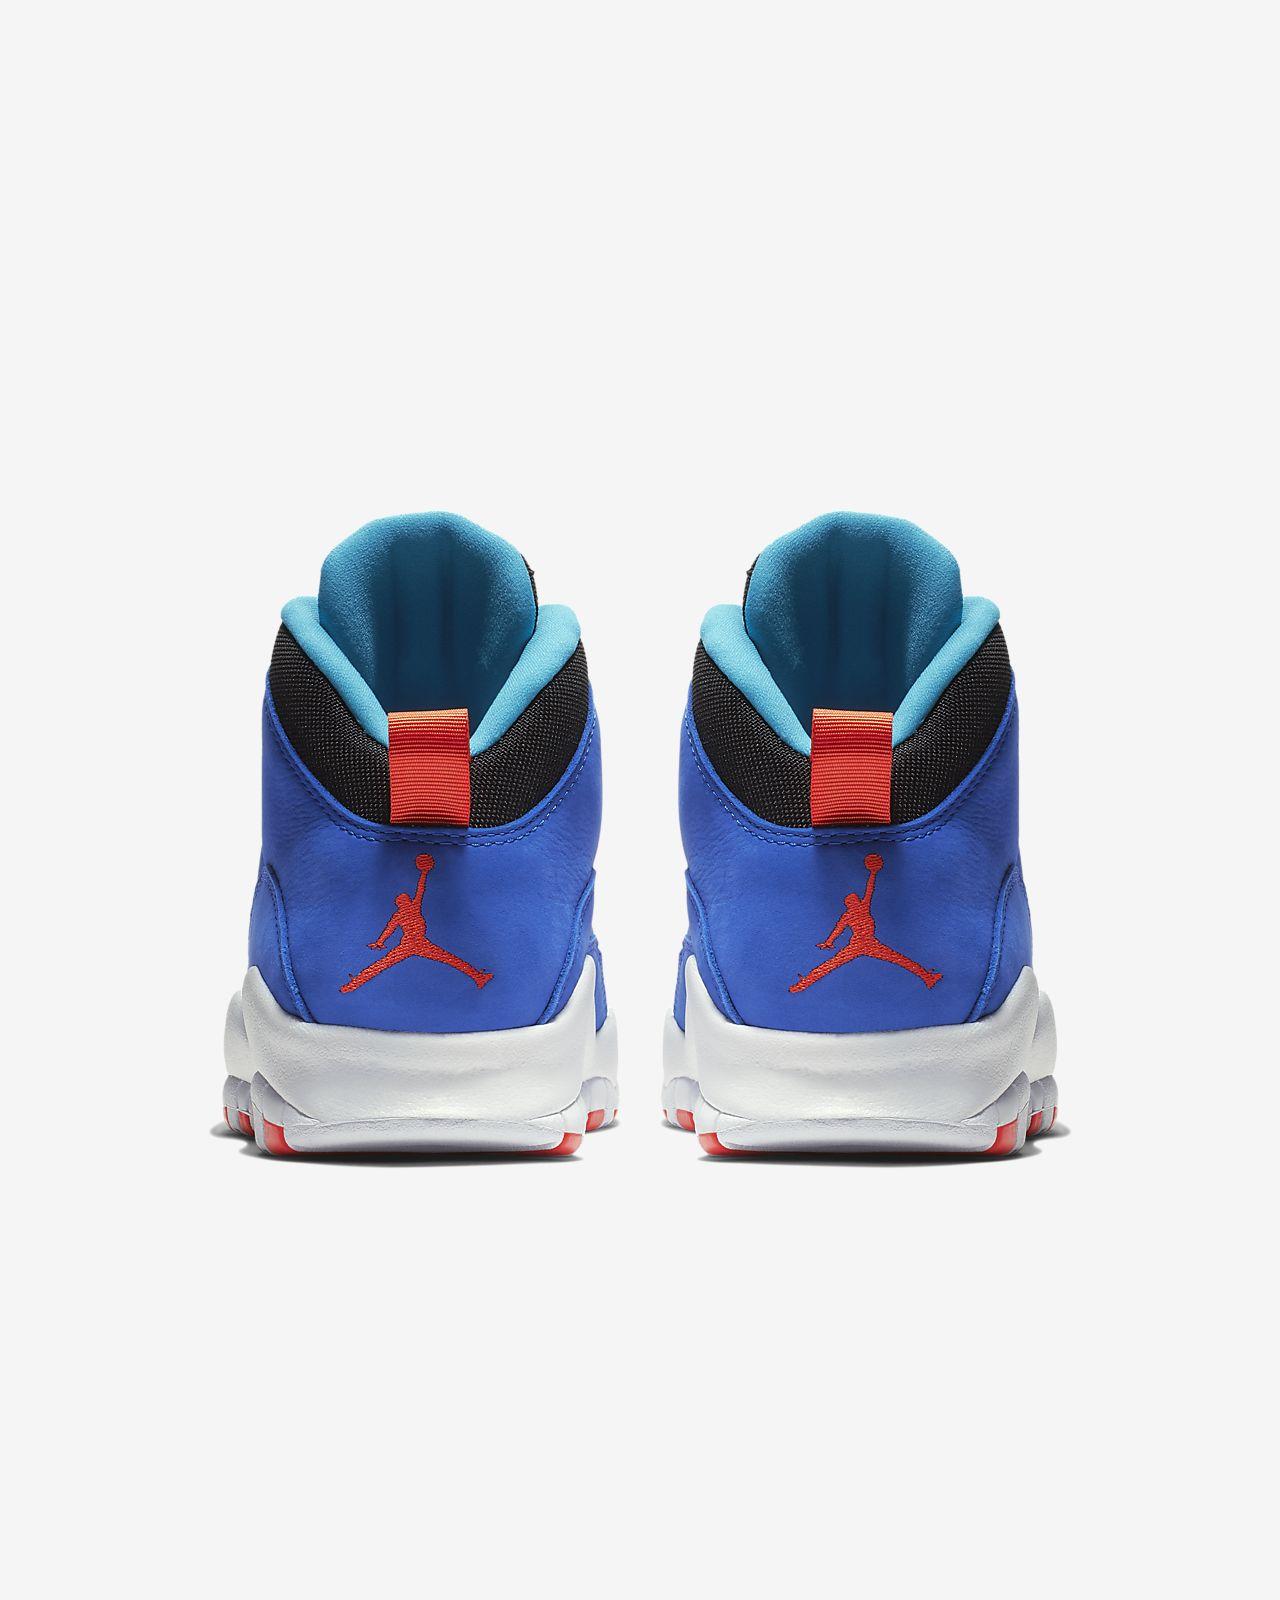 473becbc4066 Air Jordan 10 Retro Men s Shoe. Nike.com GB